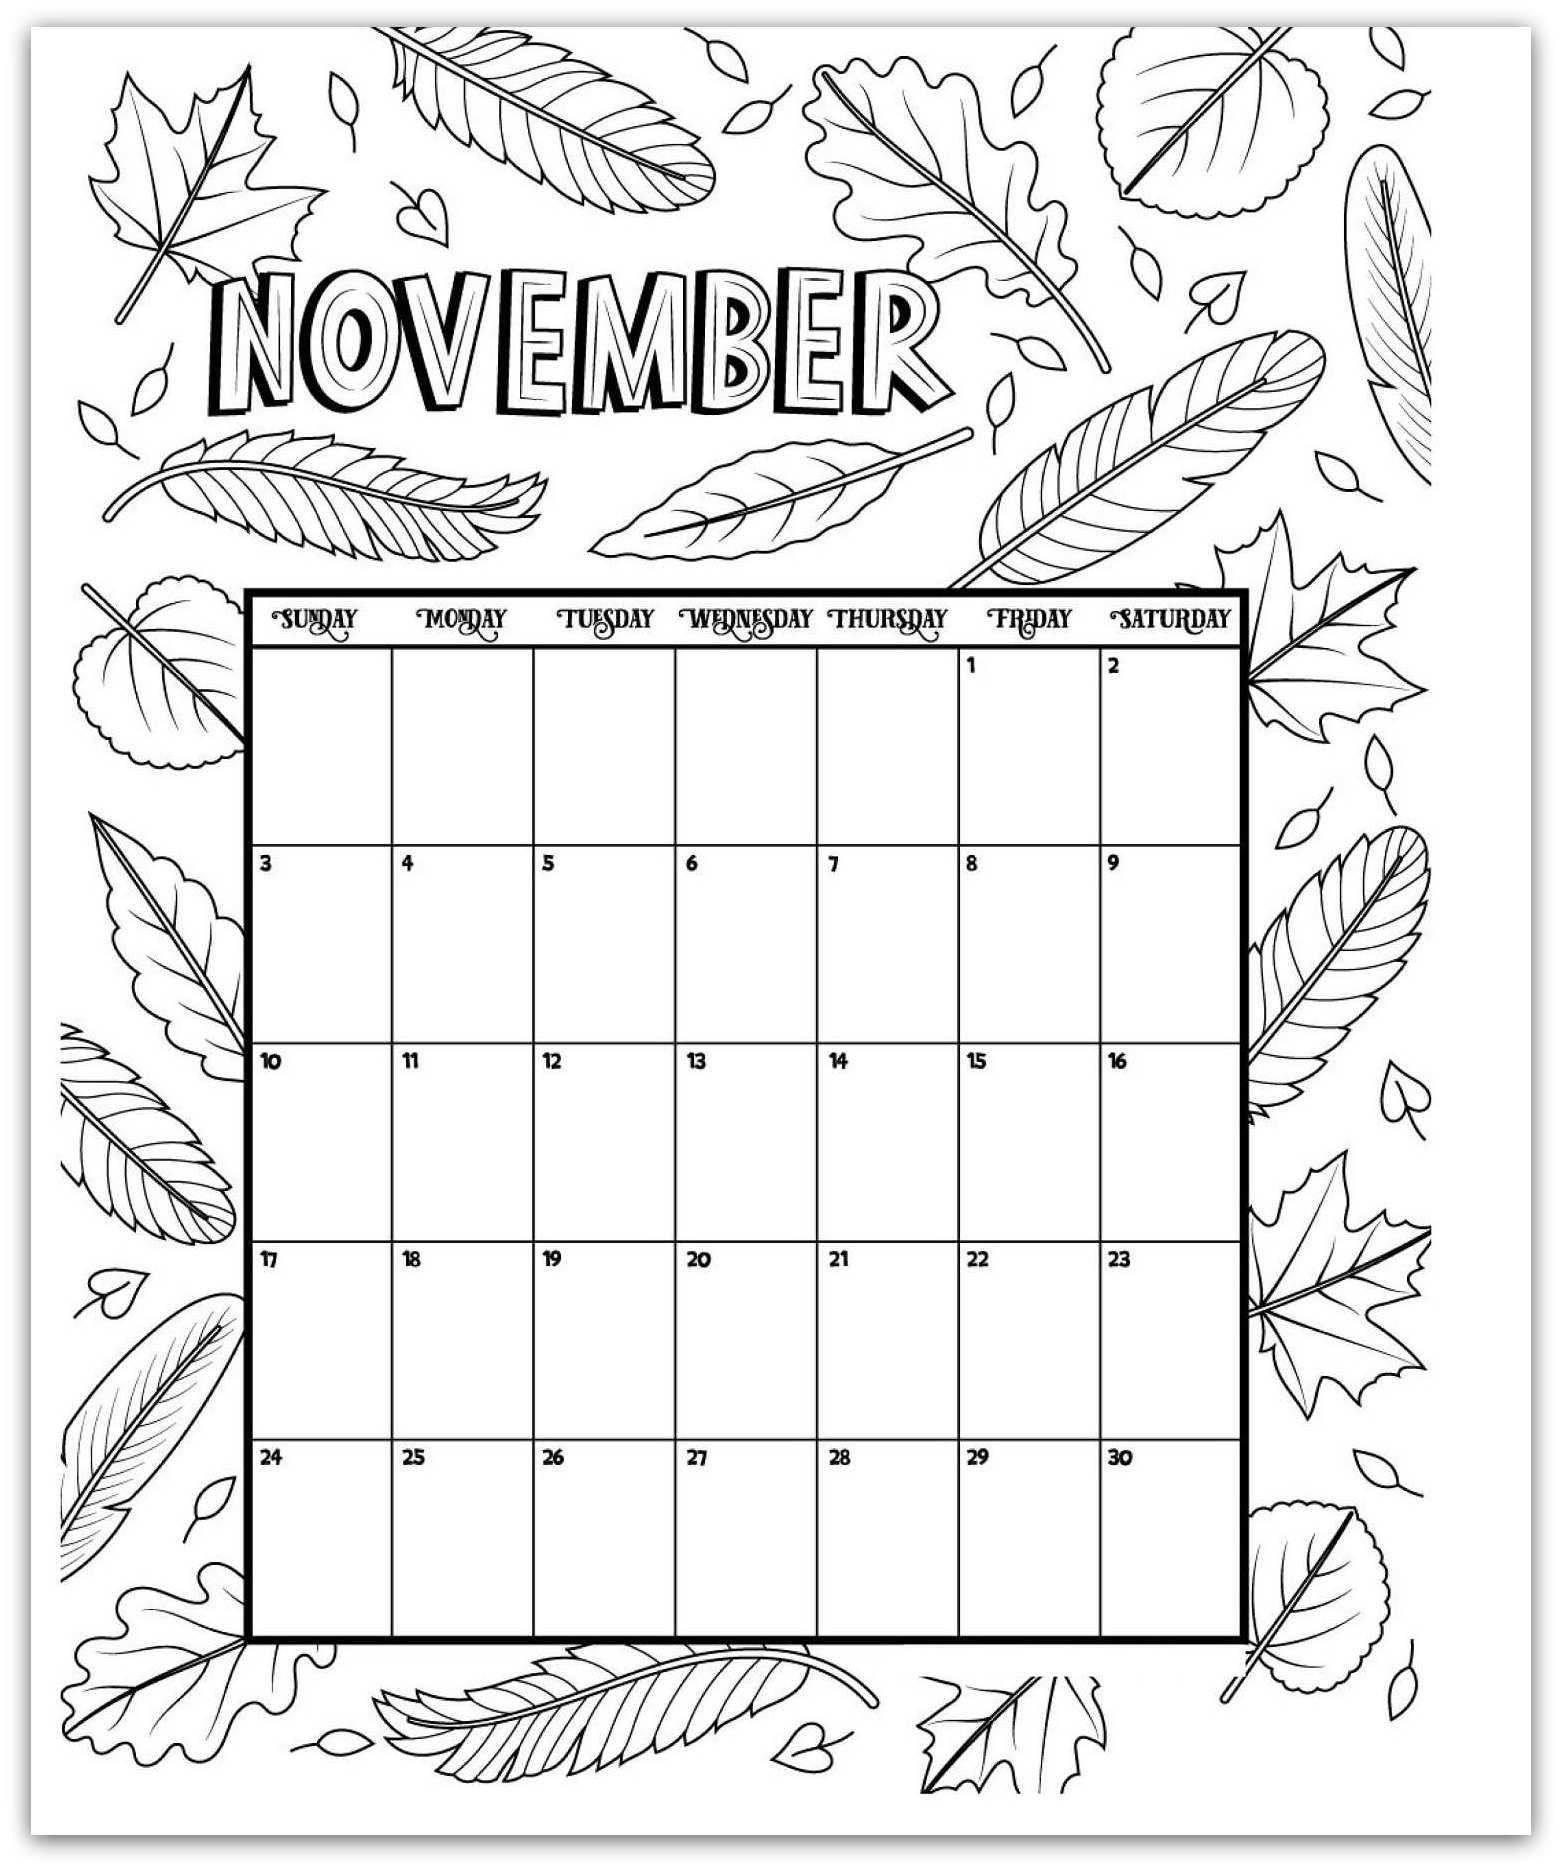 November 2019 Coloring Page Printable Calendar | Kids